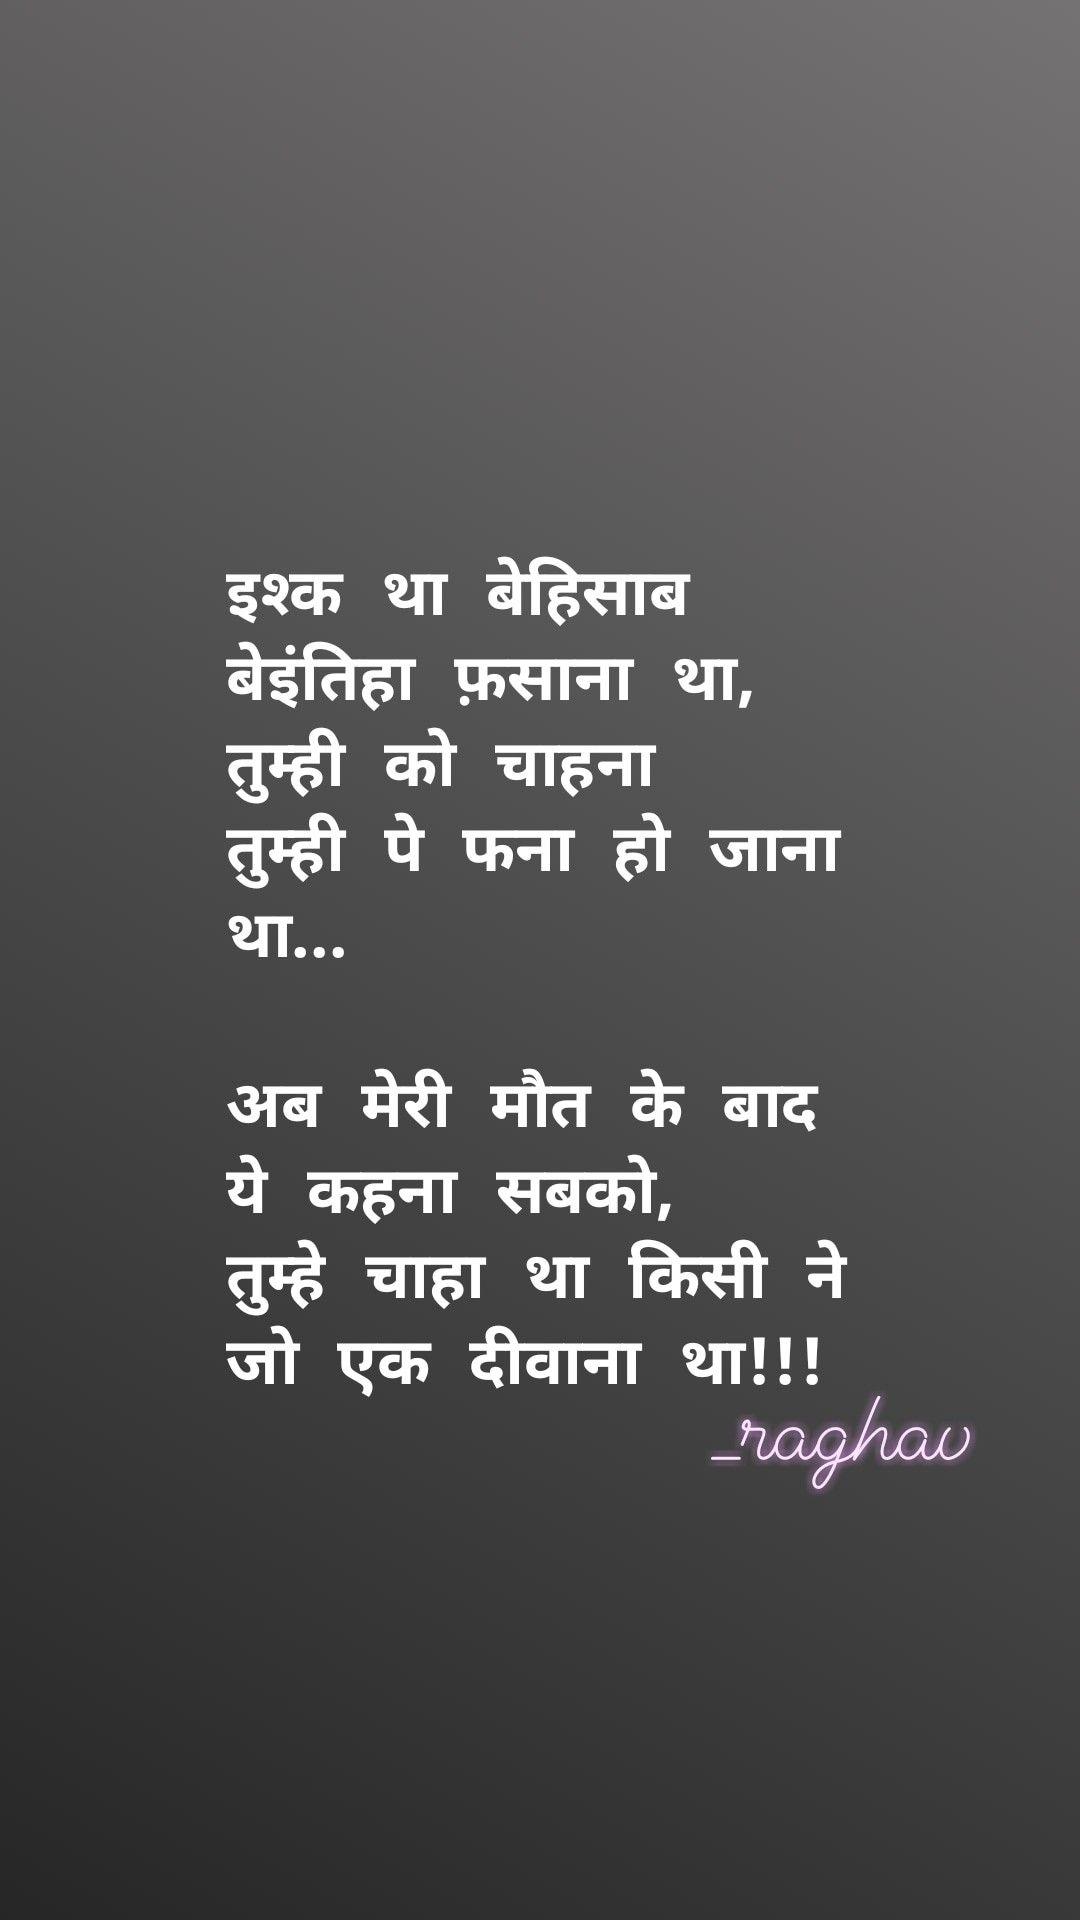 Pin By Raghav Rachit Sharma On My Writing Understanding Quotes Snap Quotes Understanding Quotes Relationships